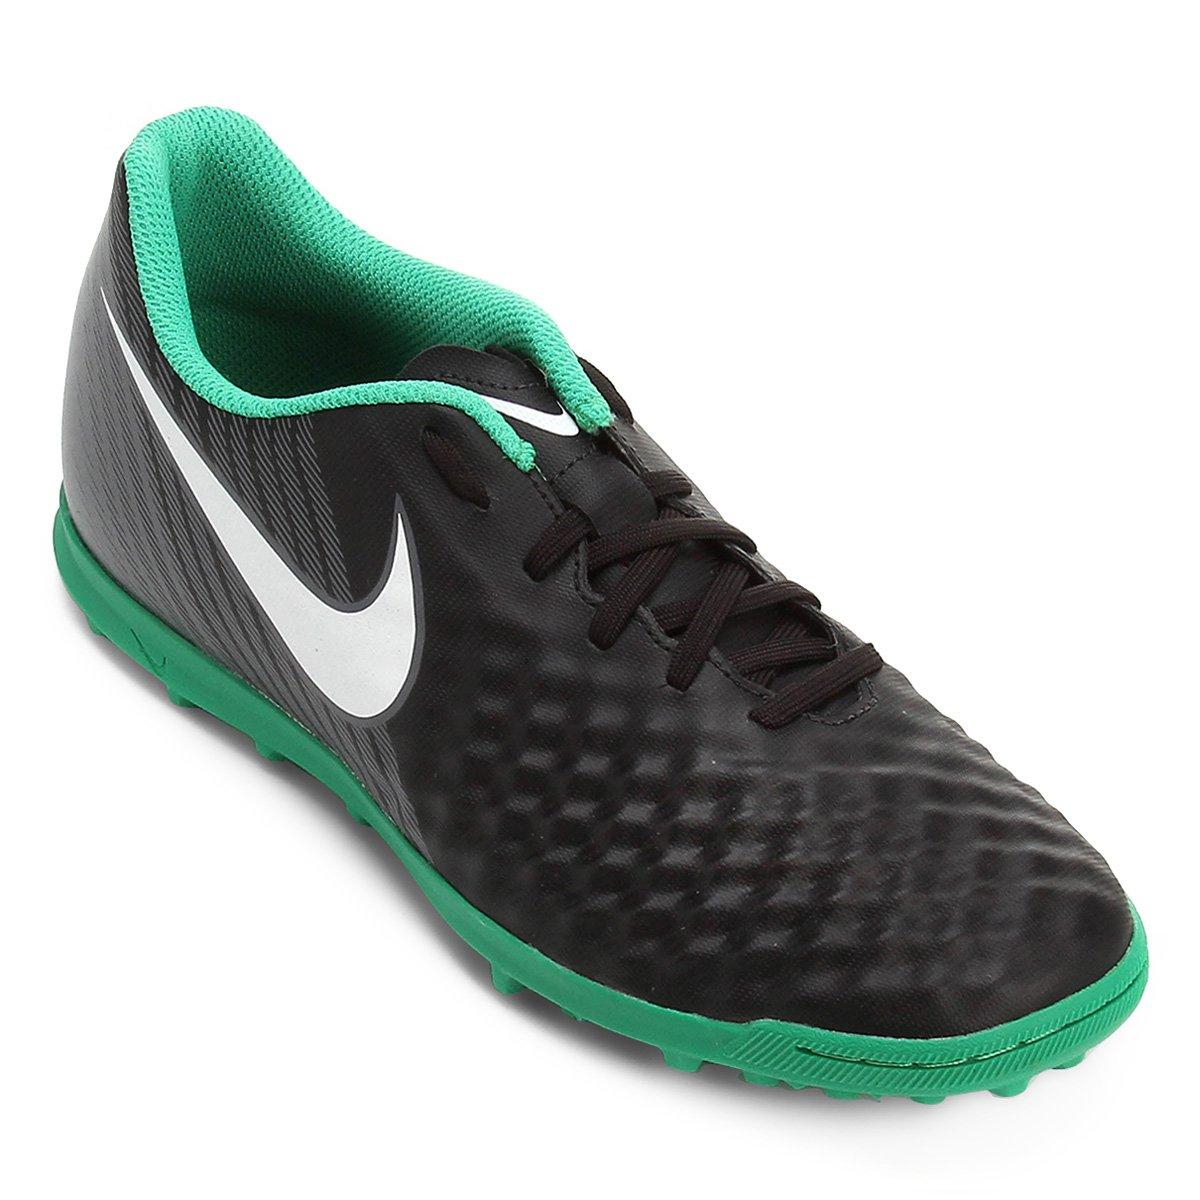 967dc4f9e87 Chuteira Society Nike Magista Ola II TF - Compre Agora